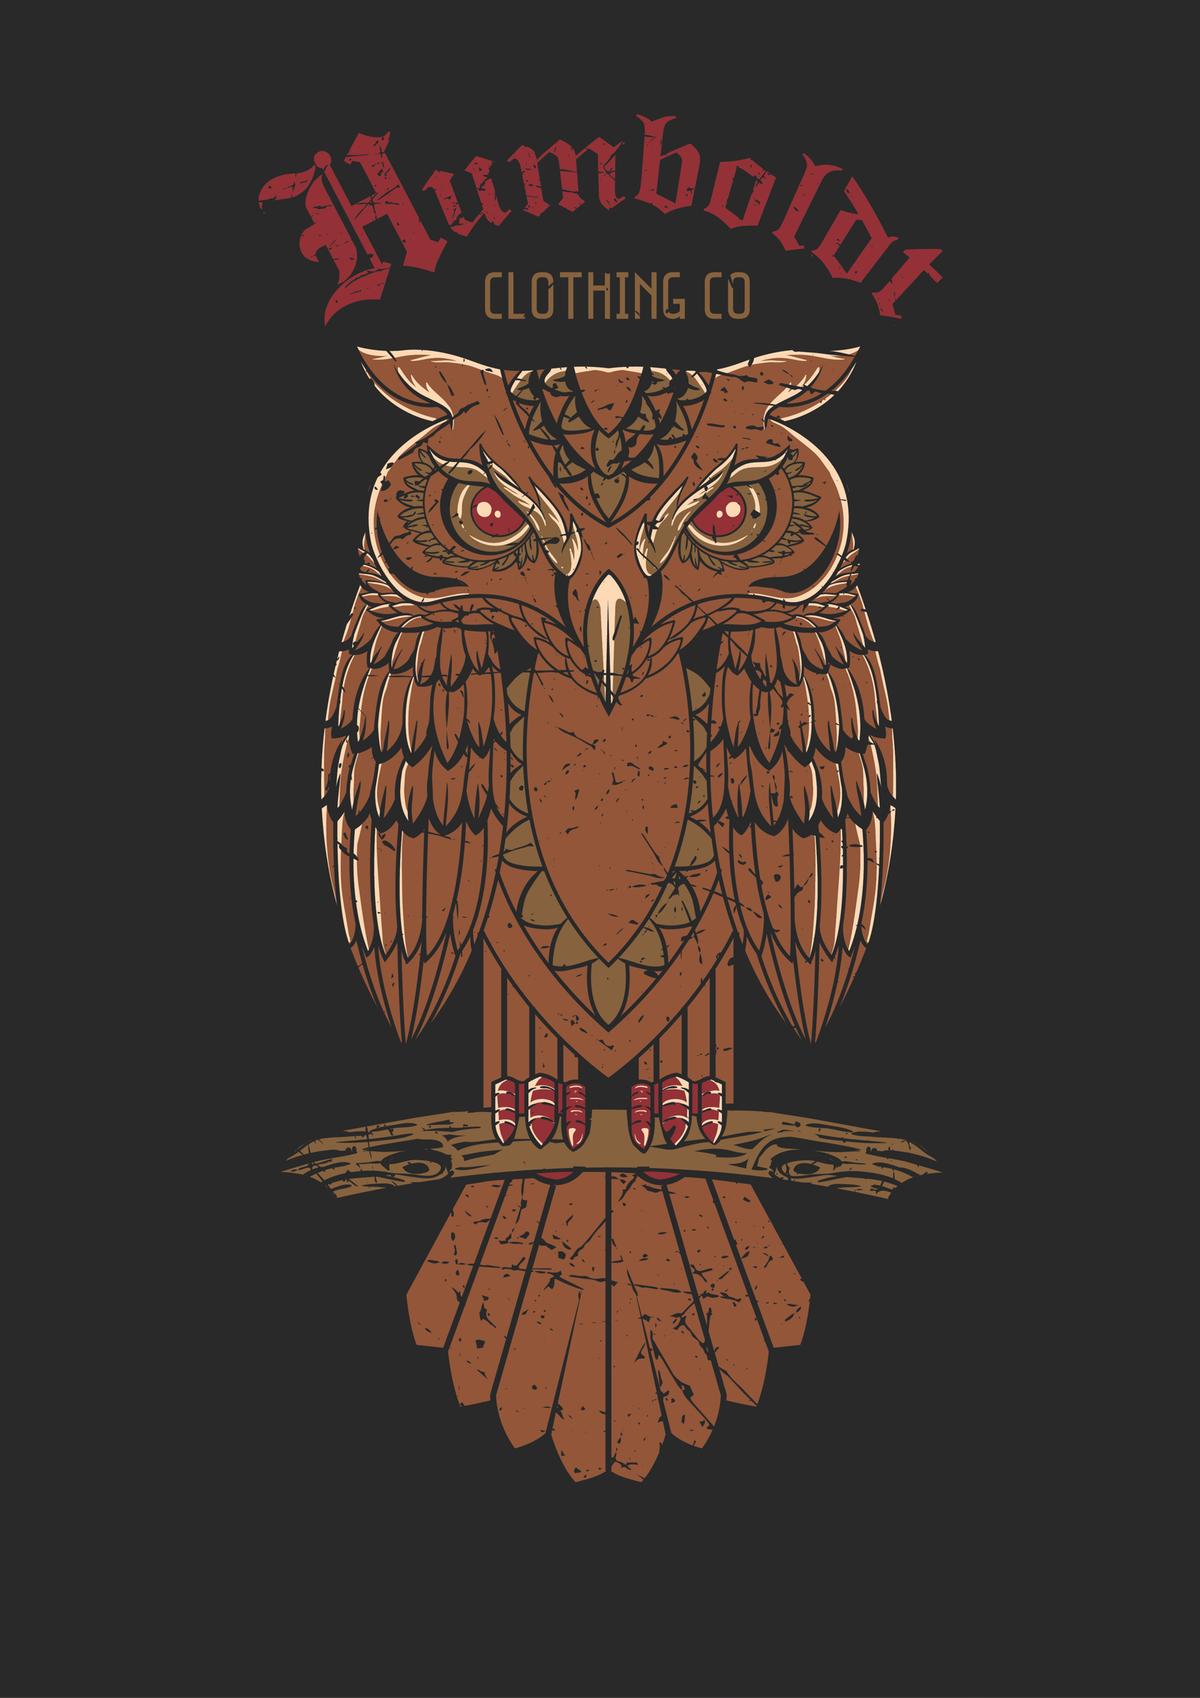 Humboldt Clothing Co Owl design